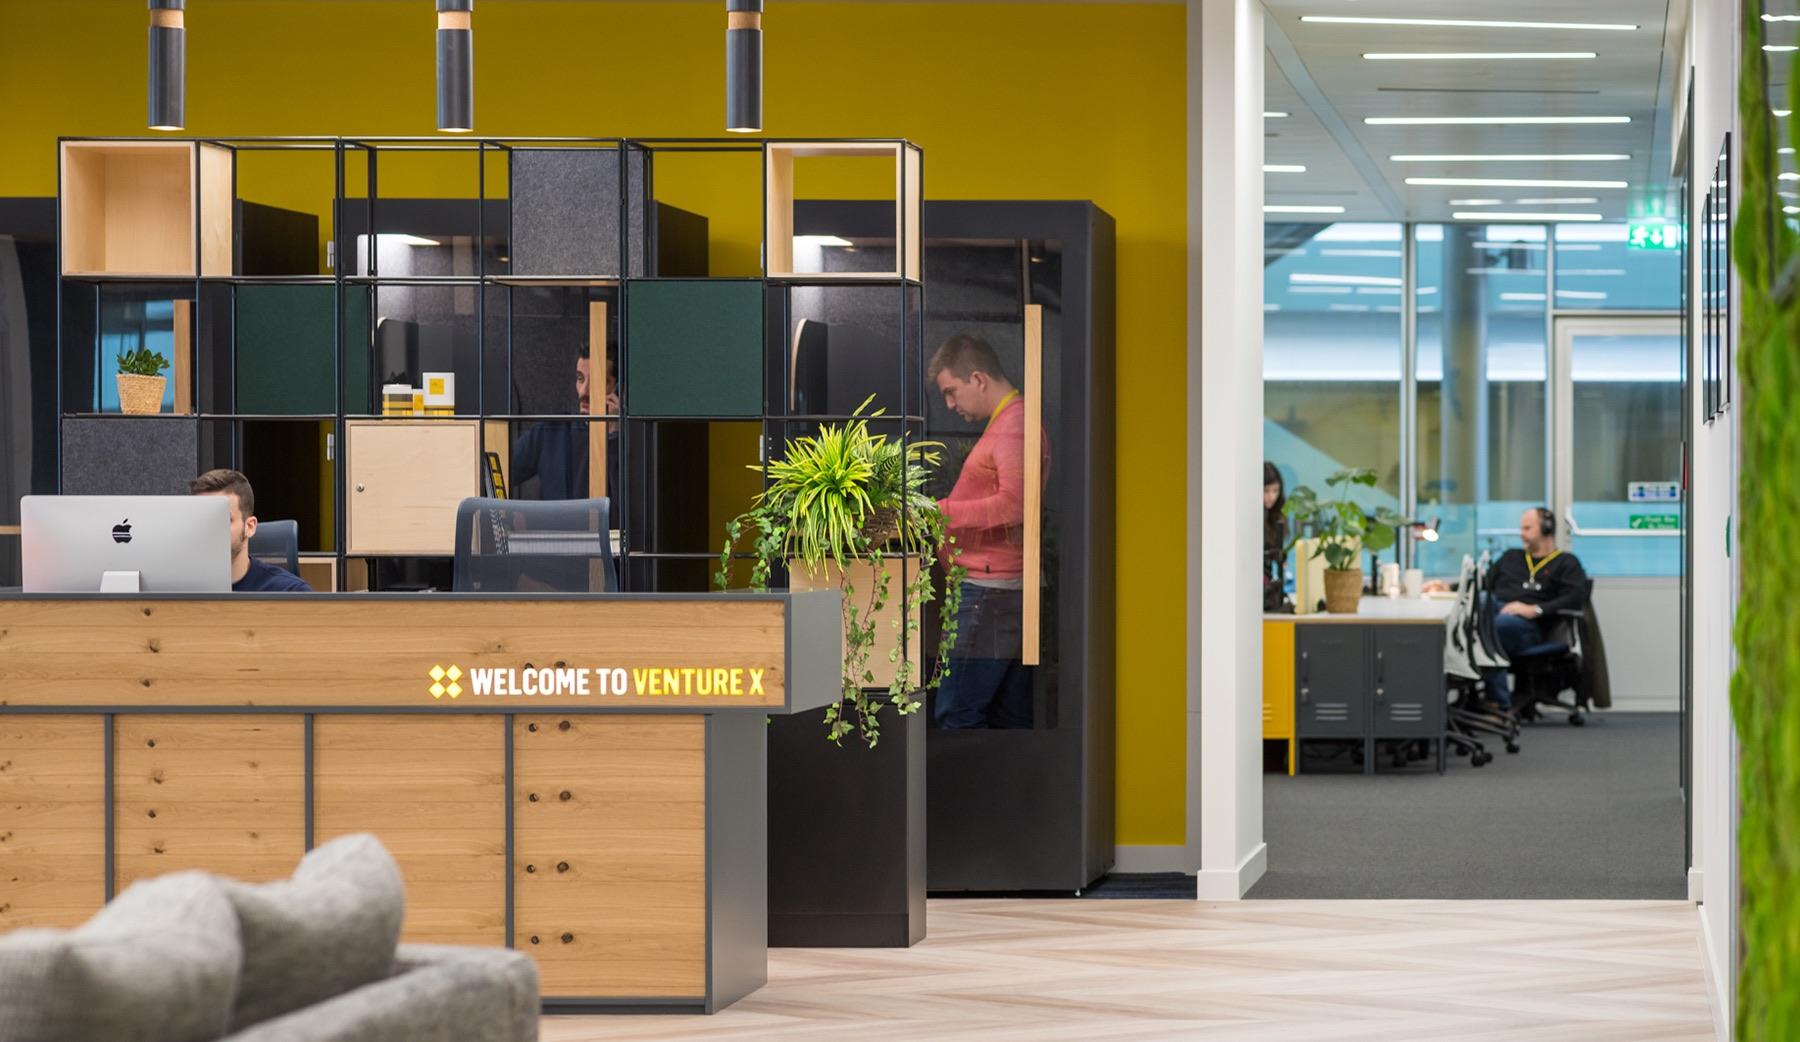 venture-x-london-office-5